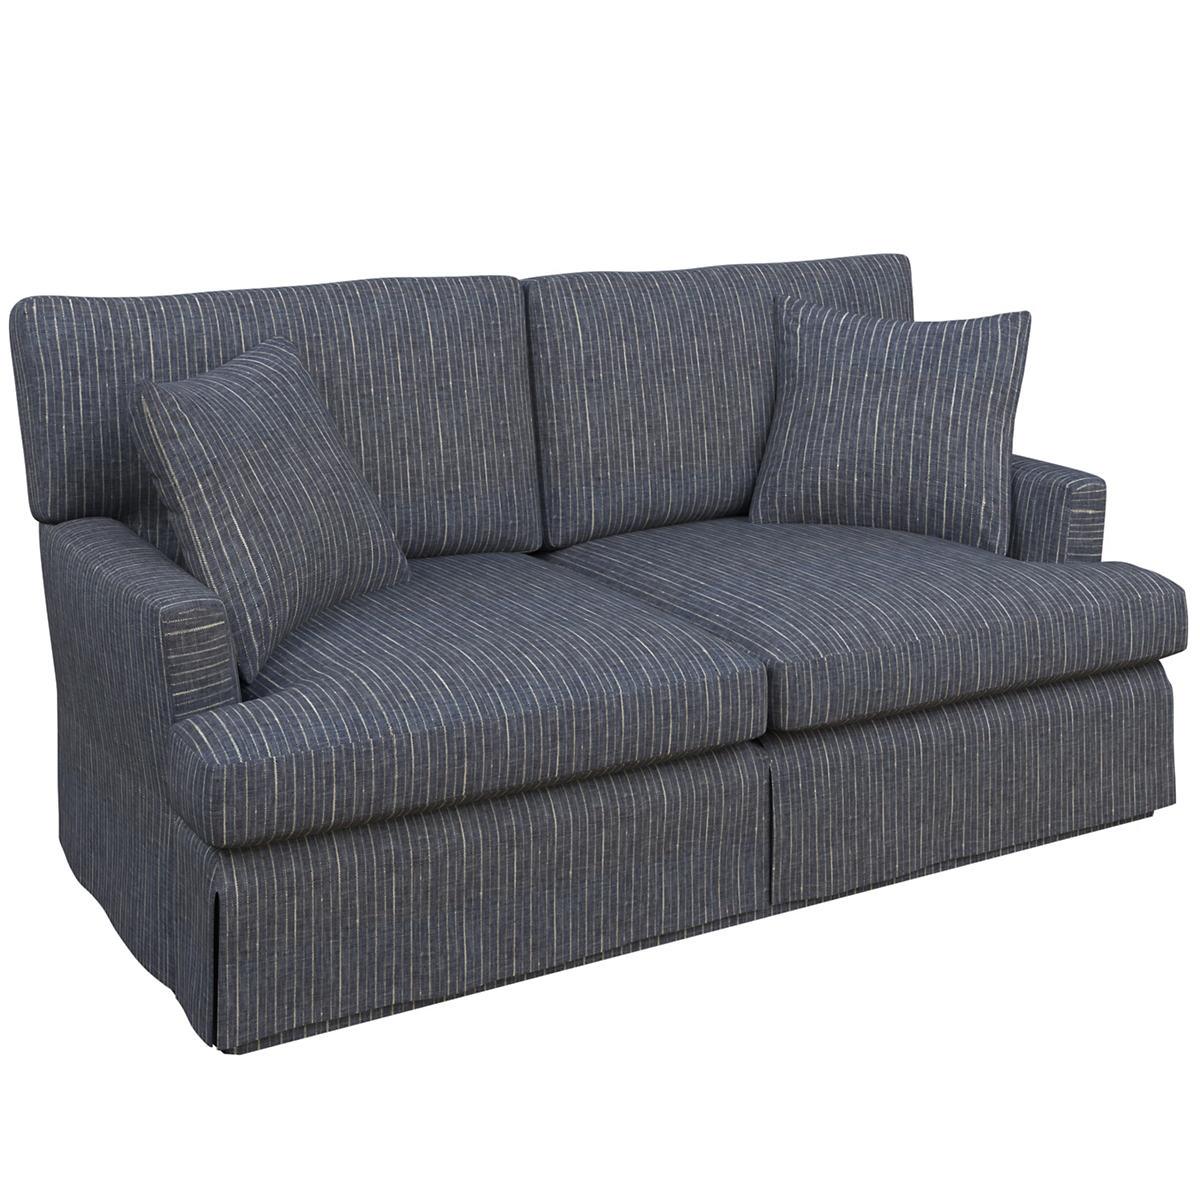 Vintage Stripe Indigo Saybrook 2 Seater Upholstered Sofa